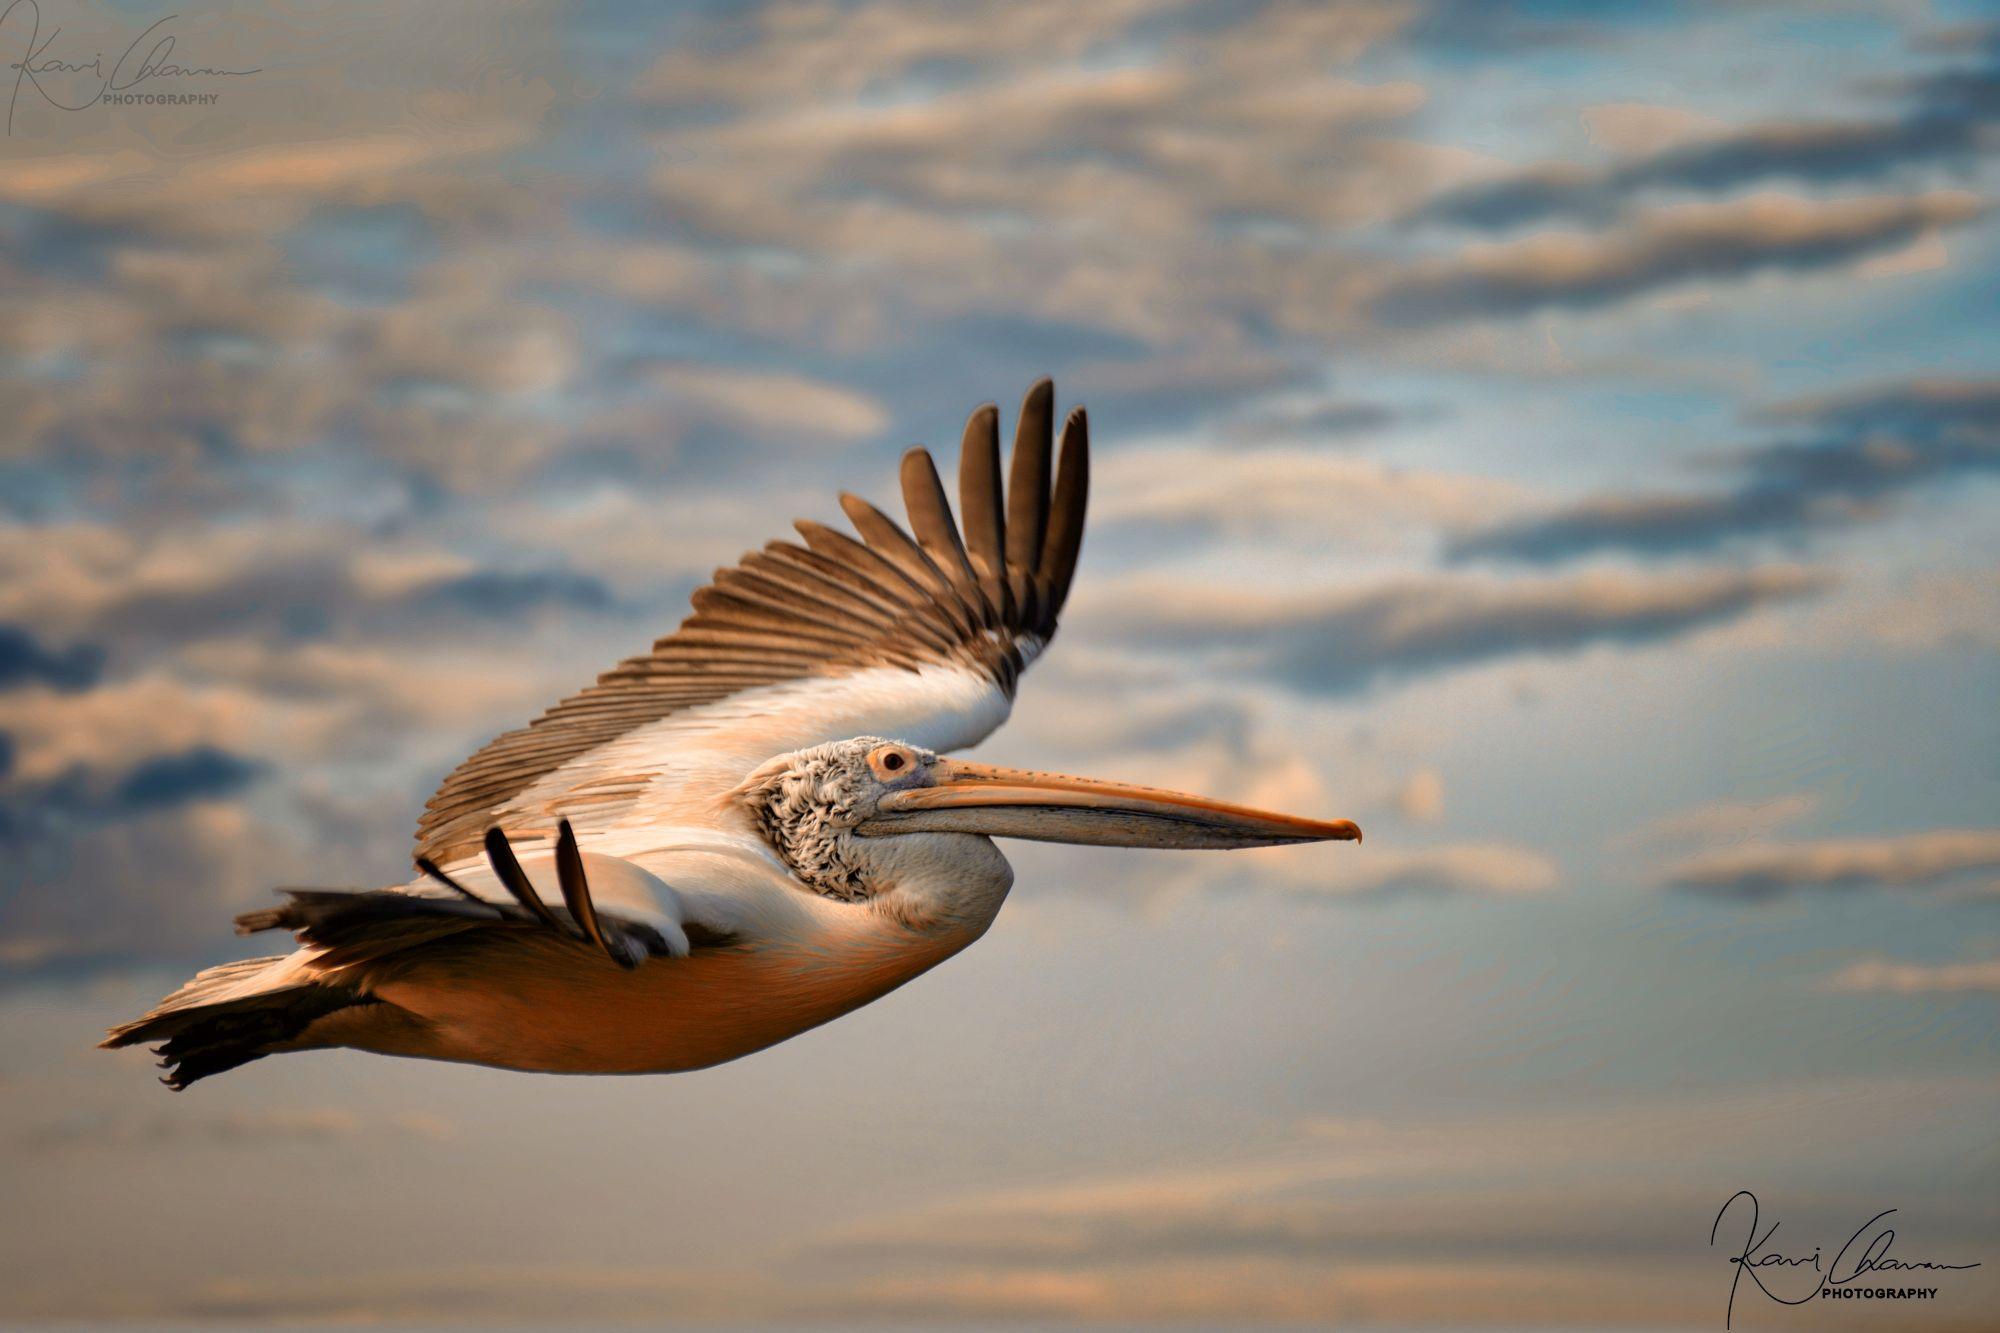 Spot-billed pelican flying high